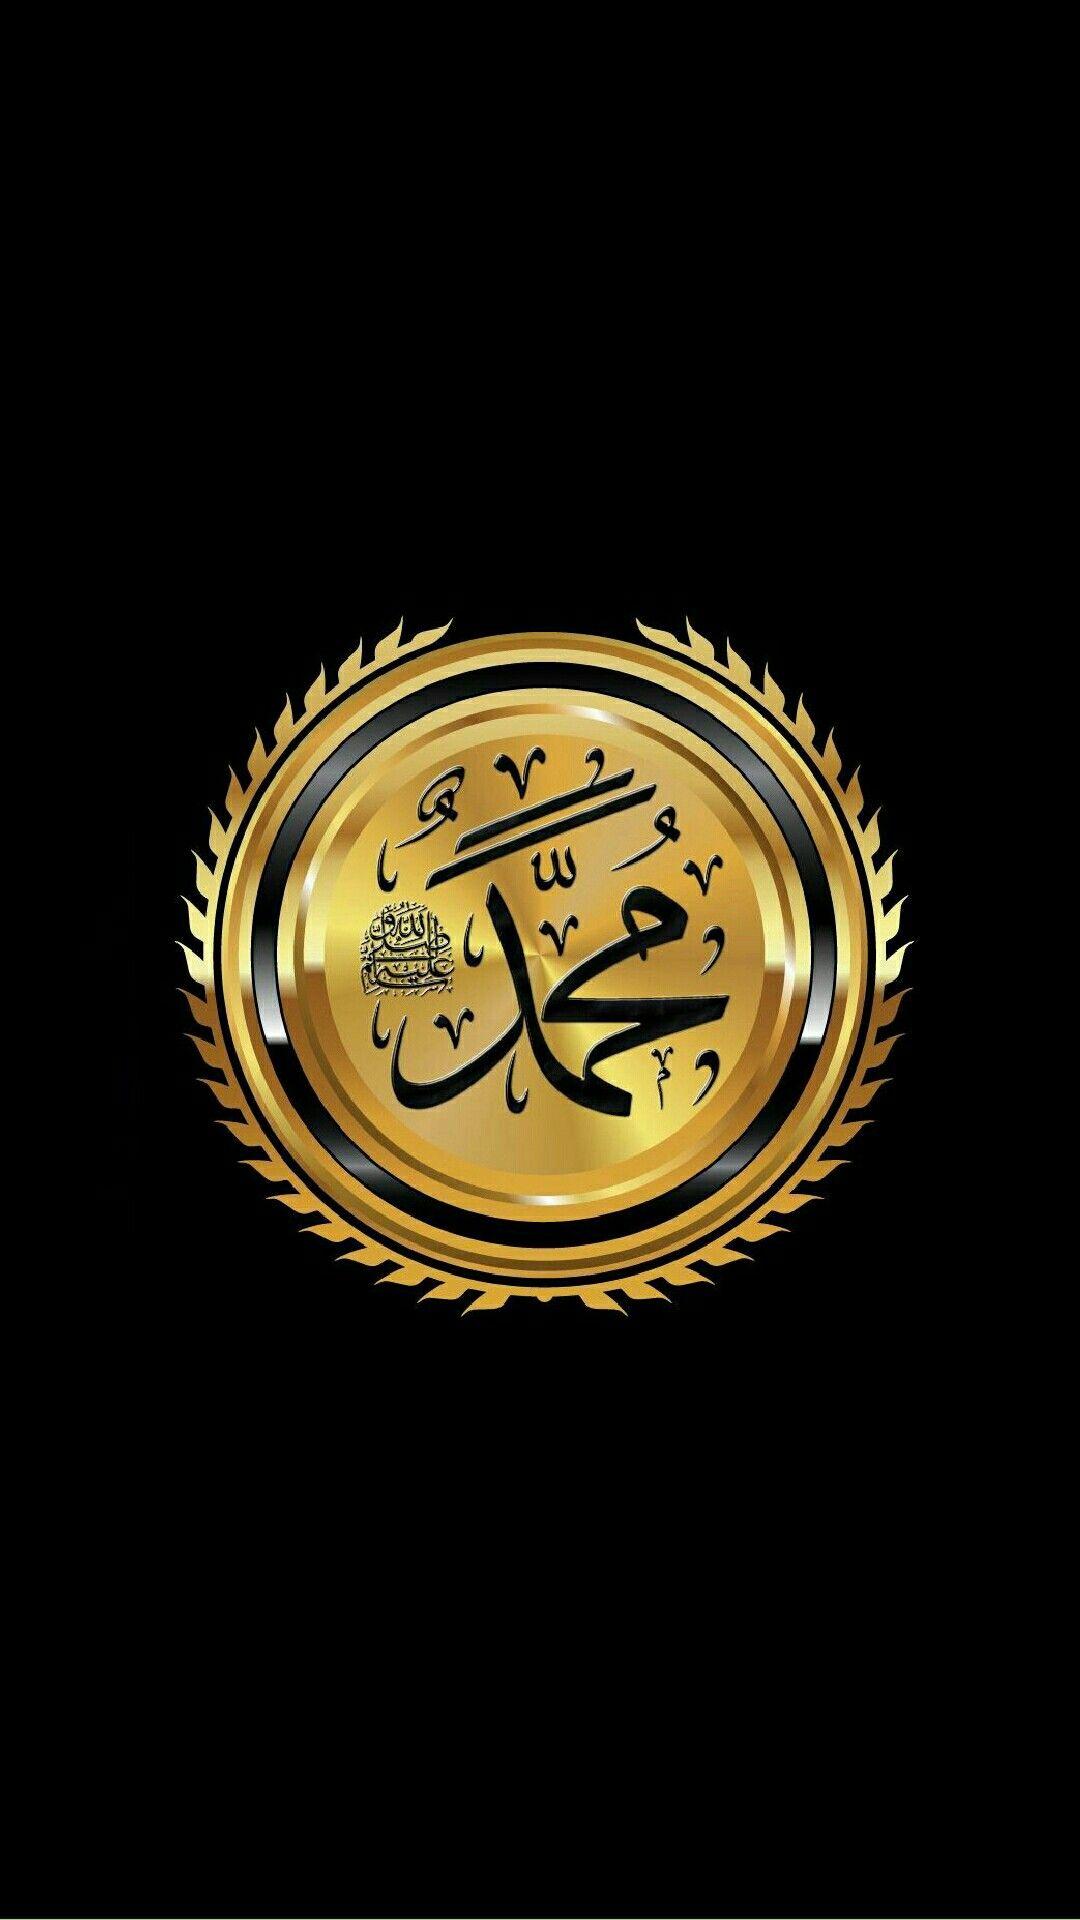 Mbahmud Seni Kaligrafi Seni Dan Kaligrafi Islam